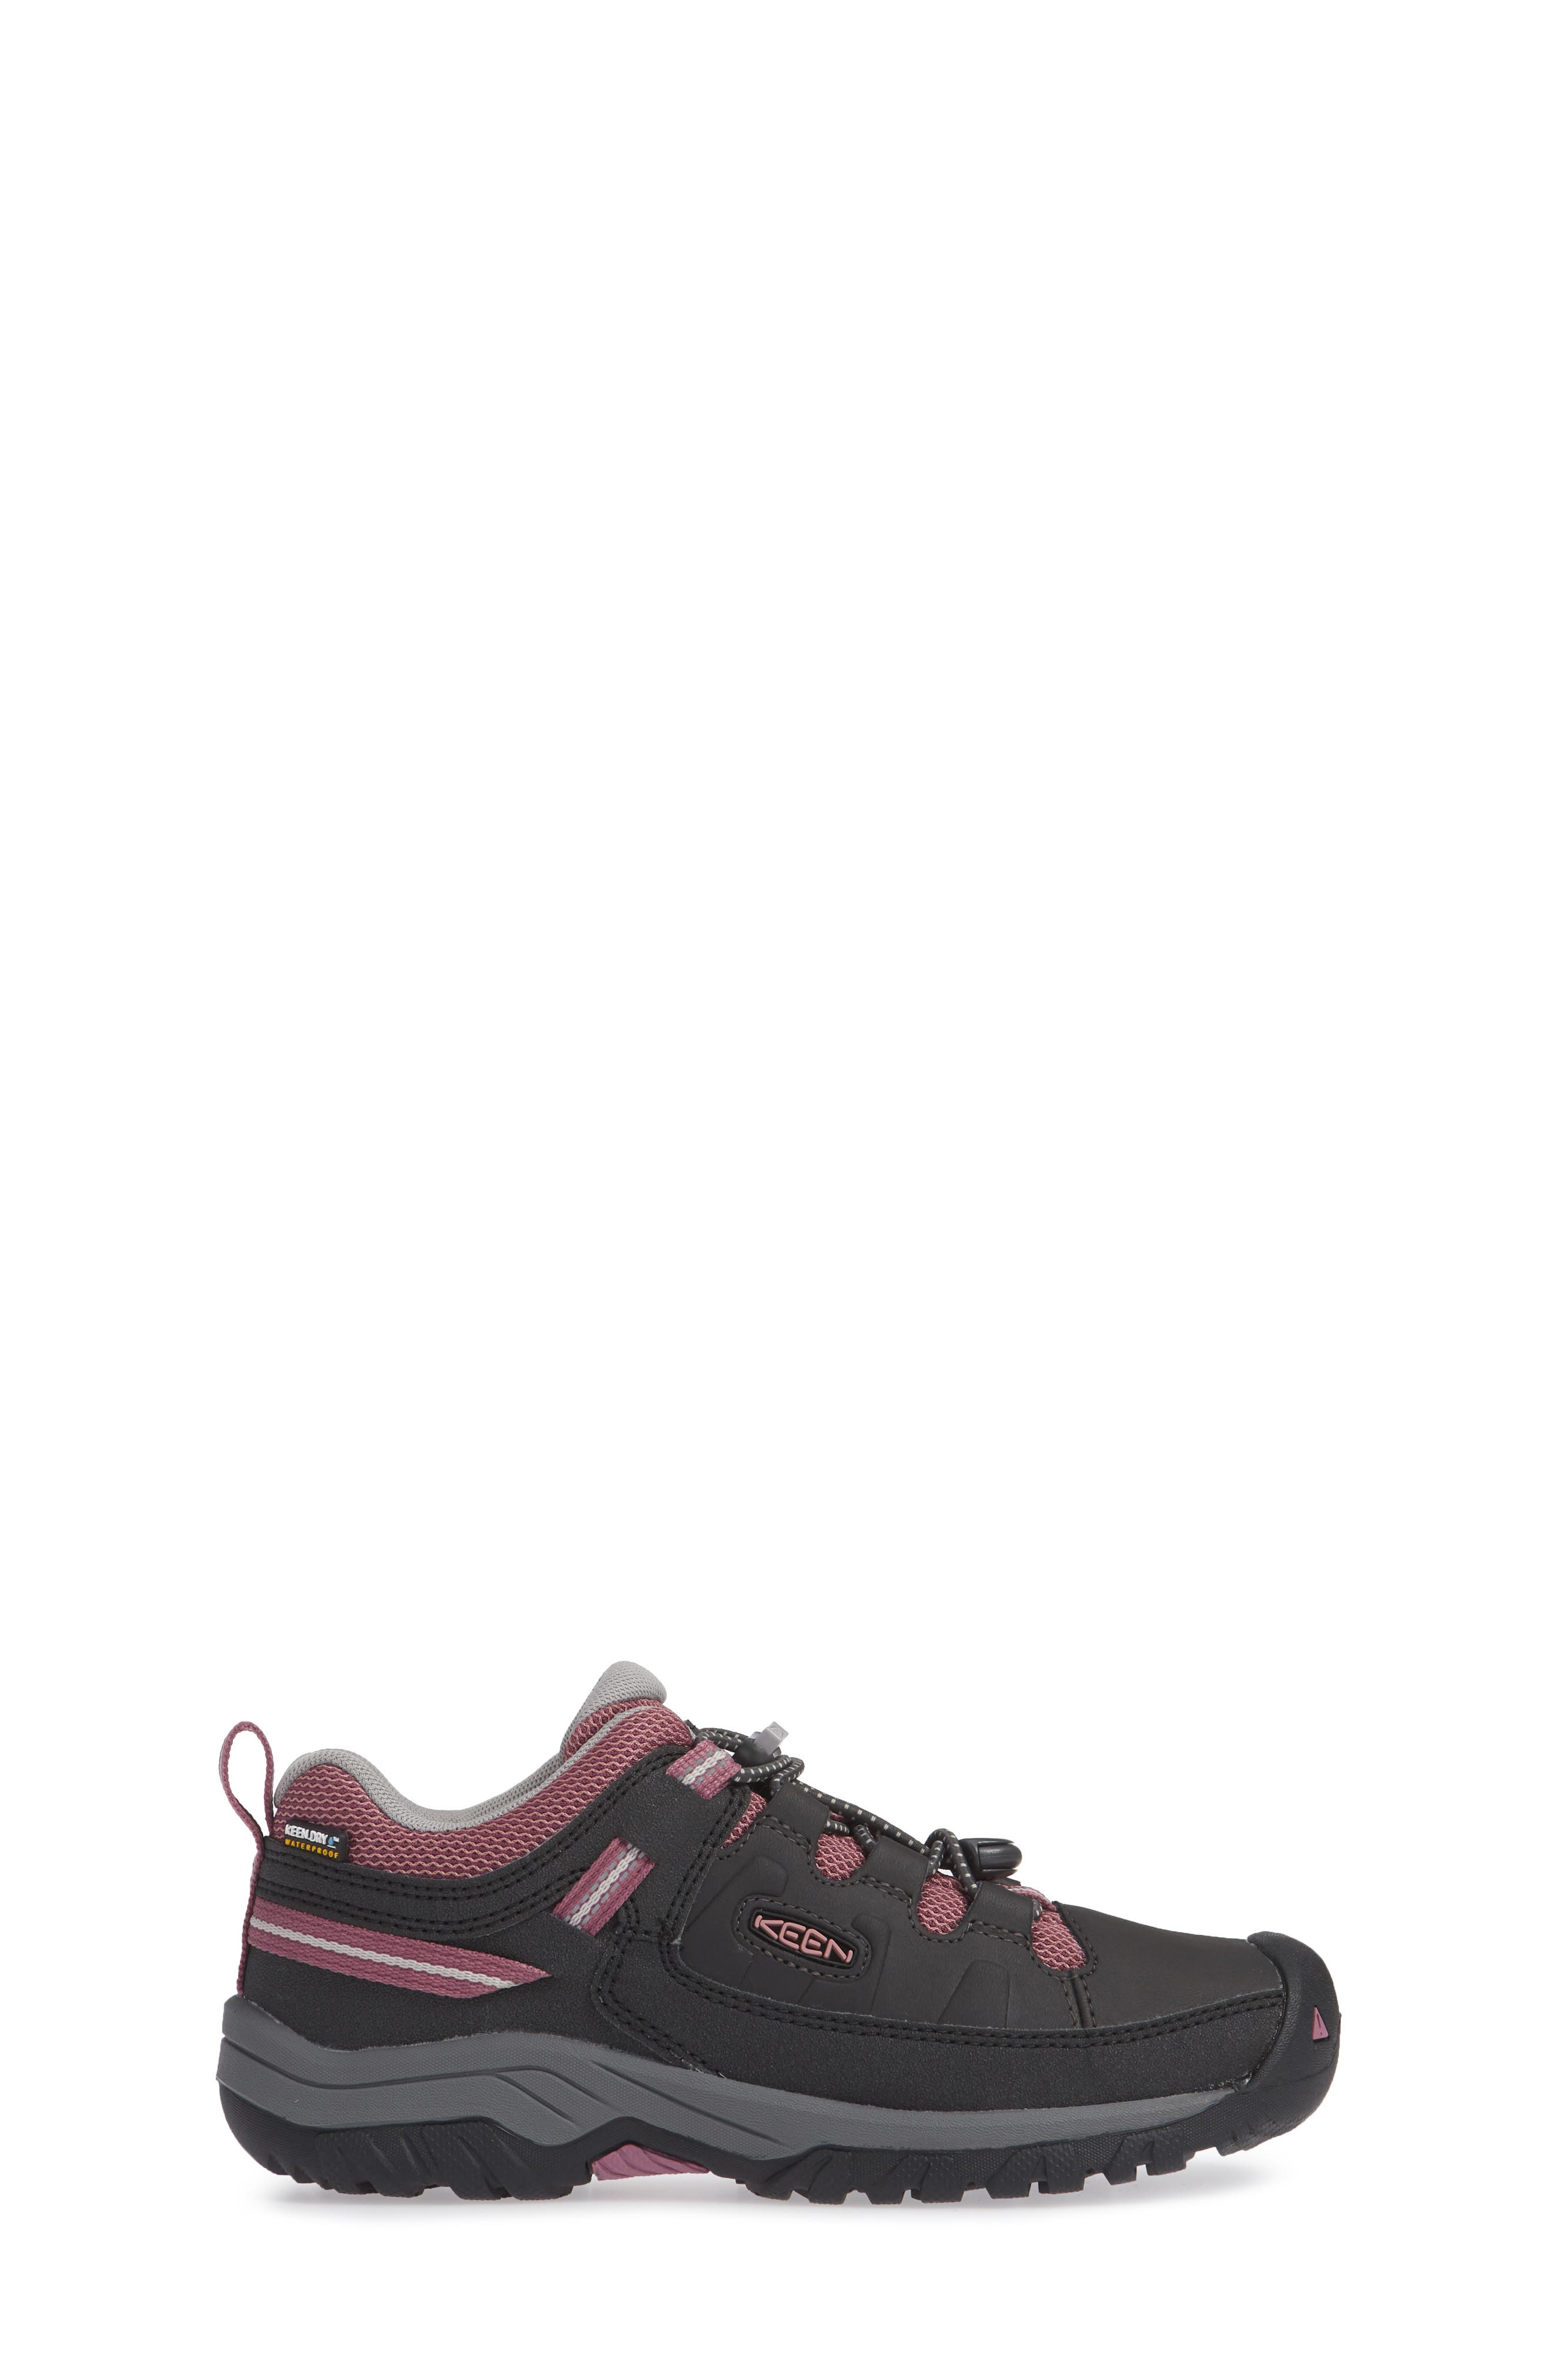 KEEN, Targhee Low Waterproof Boots, Alternate thumbnail 3, color, RAVEN/ TULIPWOOD/ TULIPWOOD